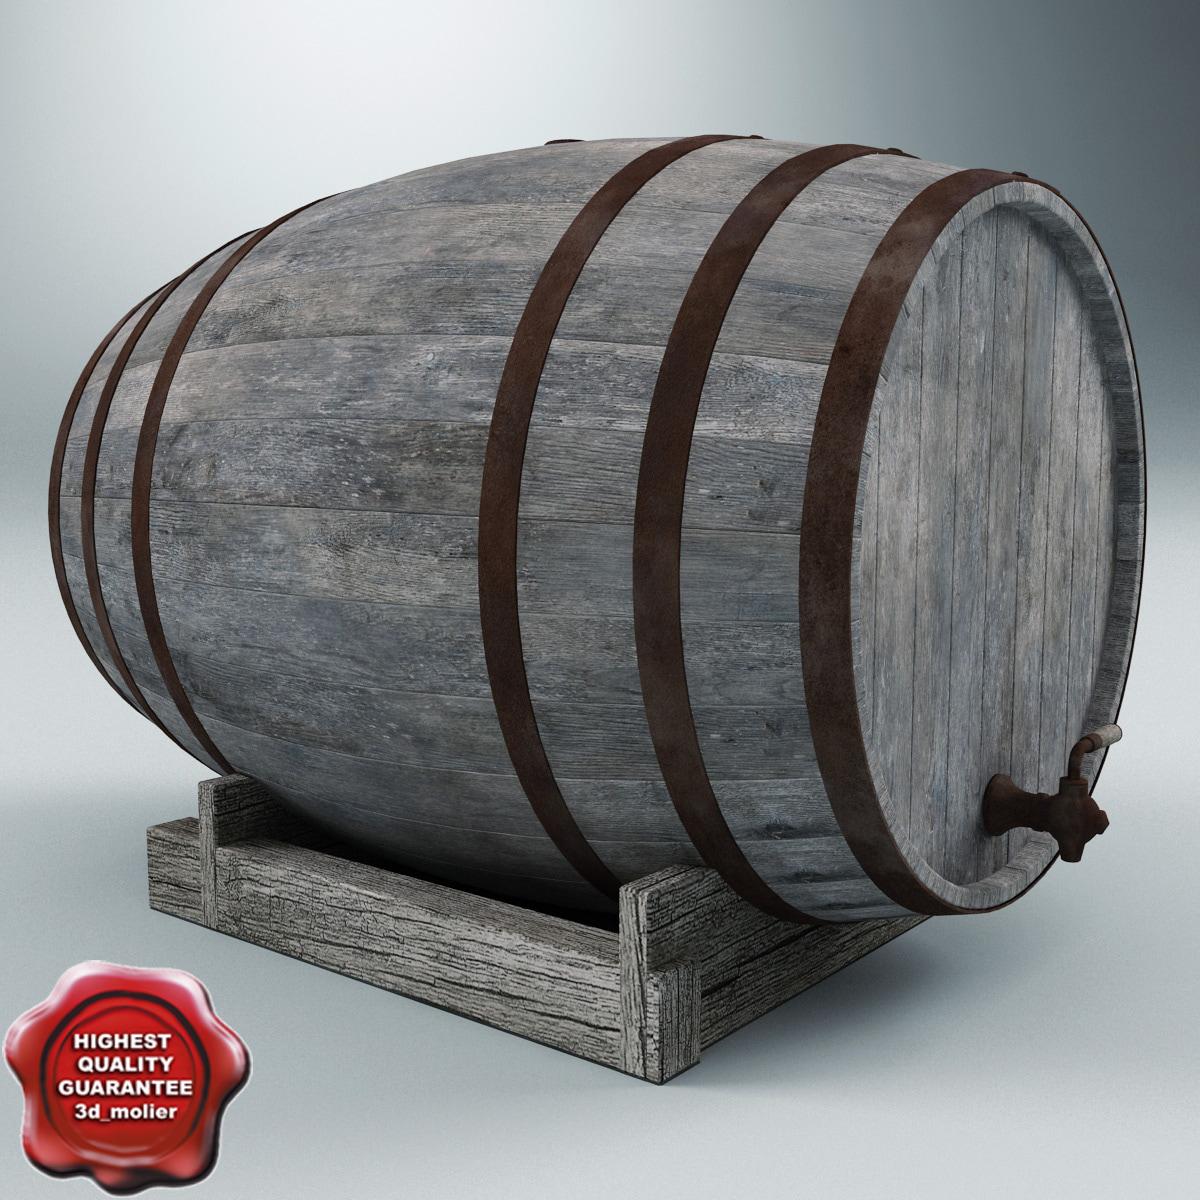 Old_Wine_Barrel_00.jpg